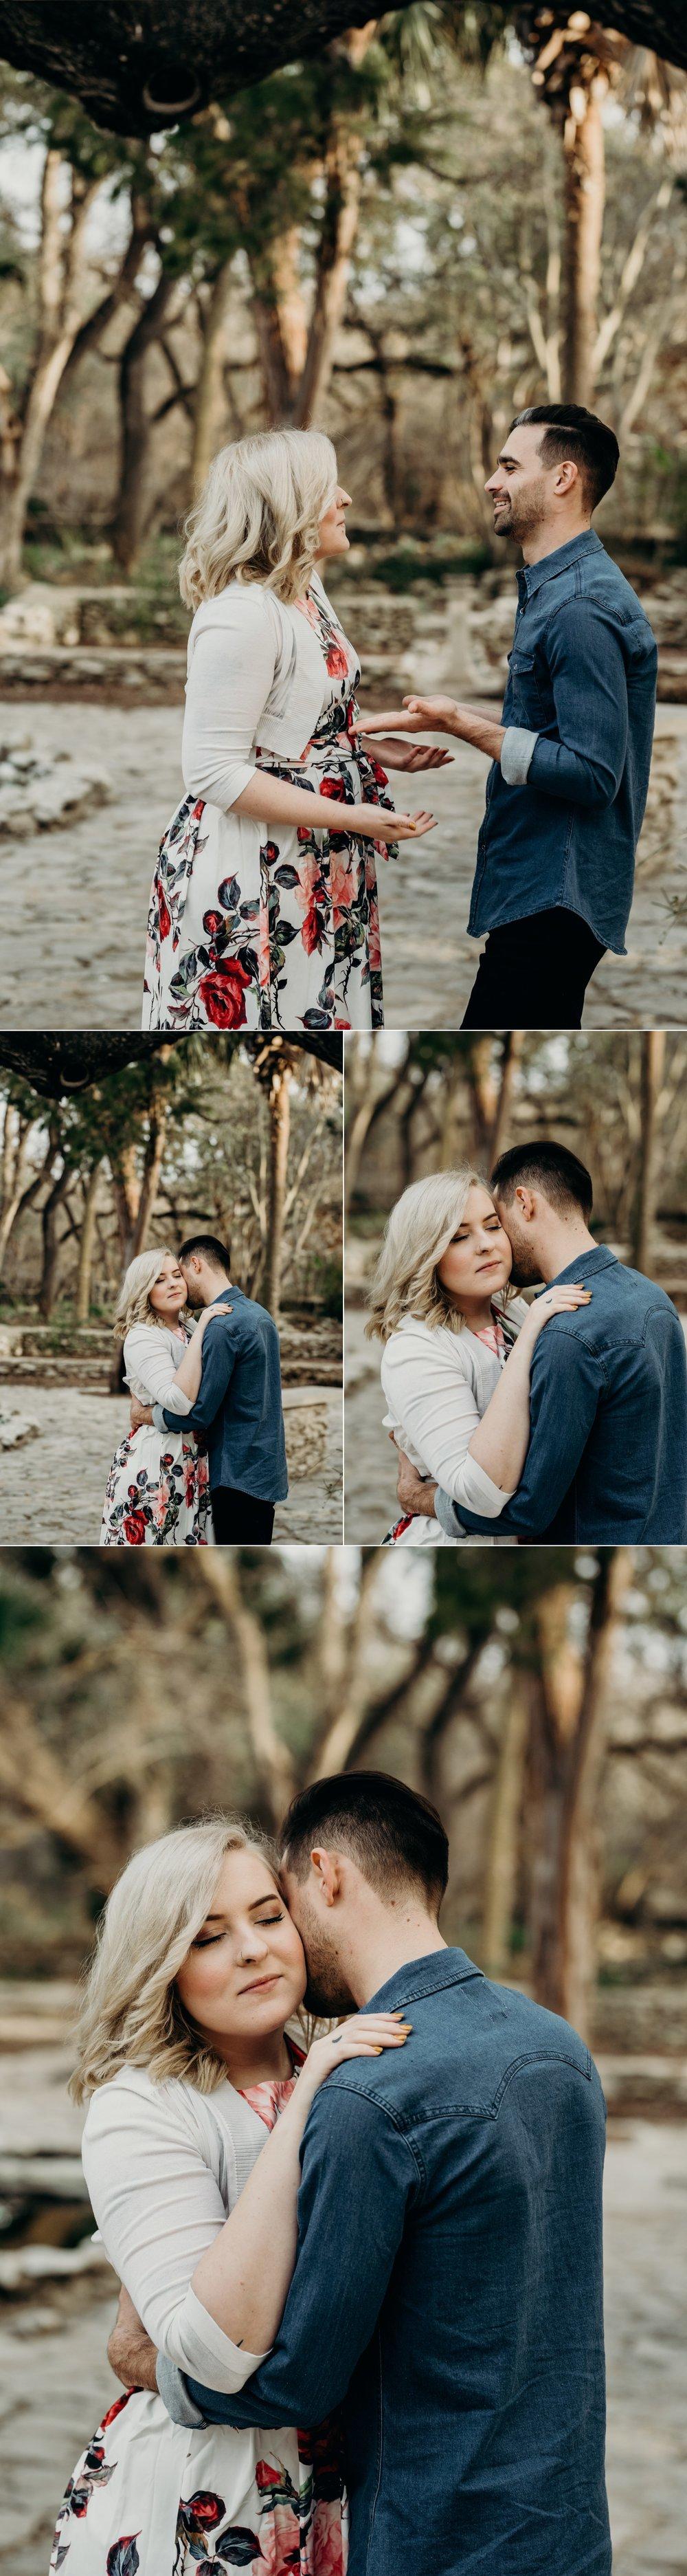 drew-andrew-texas-austin-minnesota-minneapolis-wedding-photographer-destination-elopement-intimate-adventurous_0086.jpg